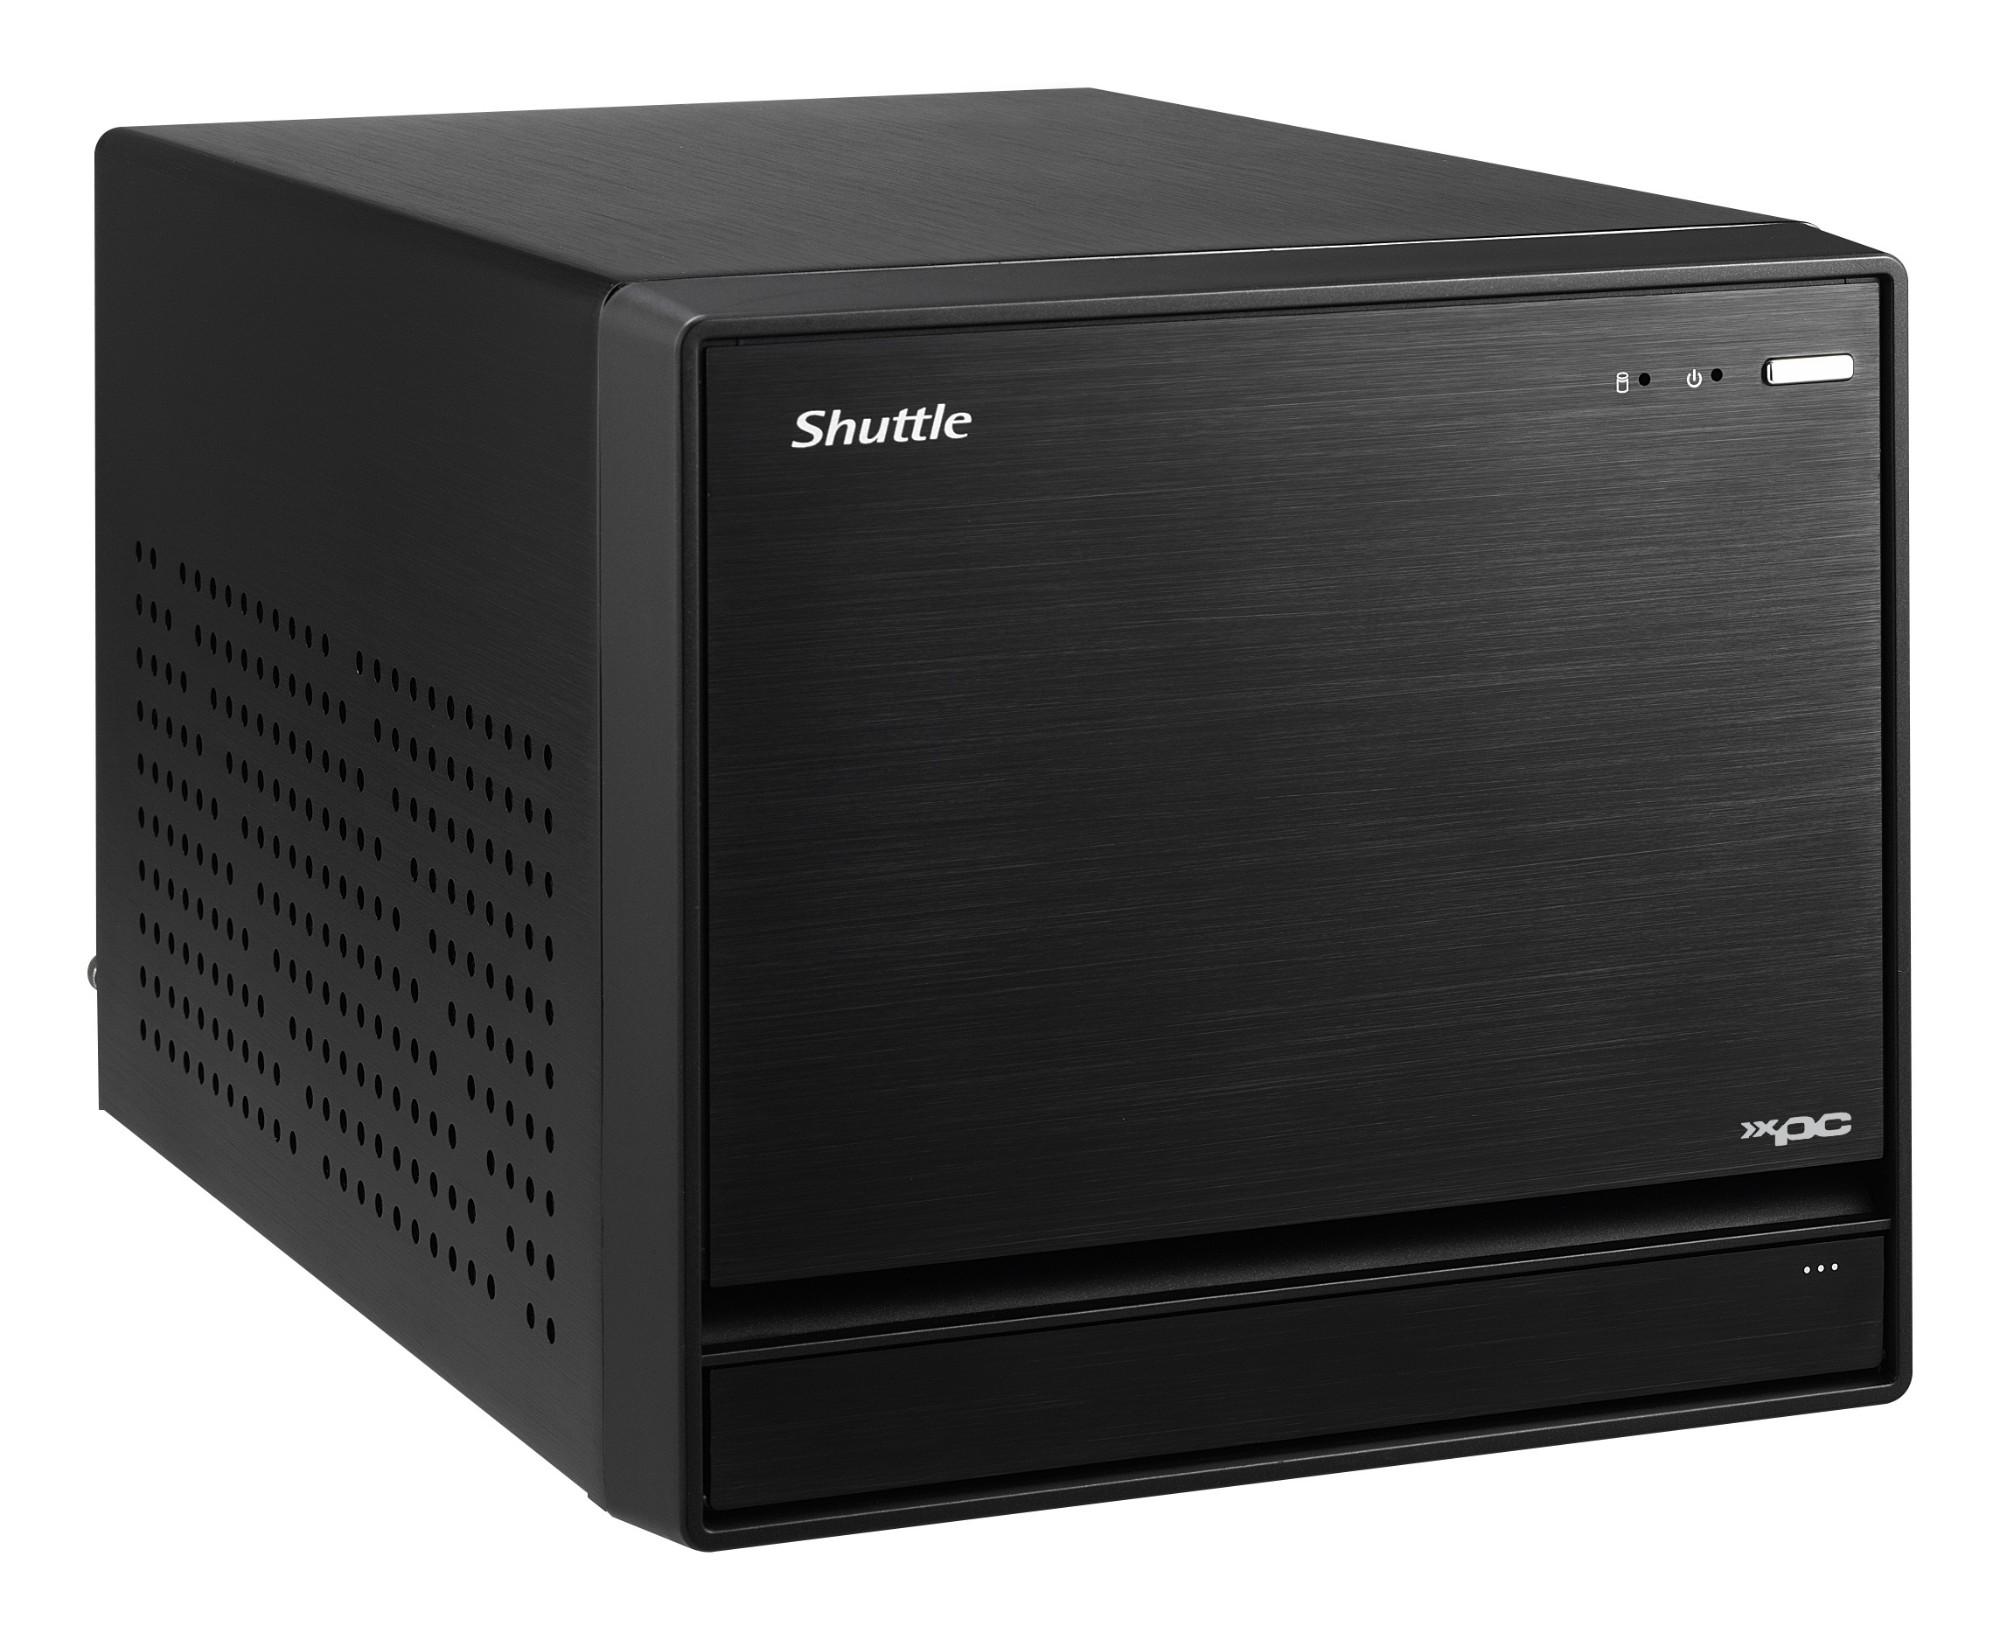 Shuttle XPC cube SZ270R8 Black Intel® Z270 LGA 1151 (Socket H4)